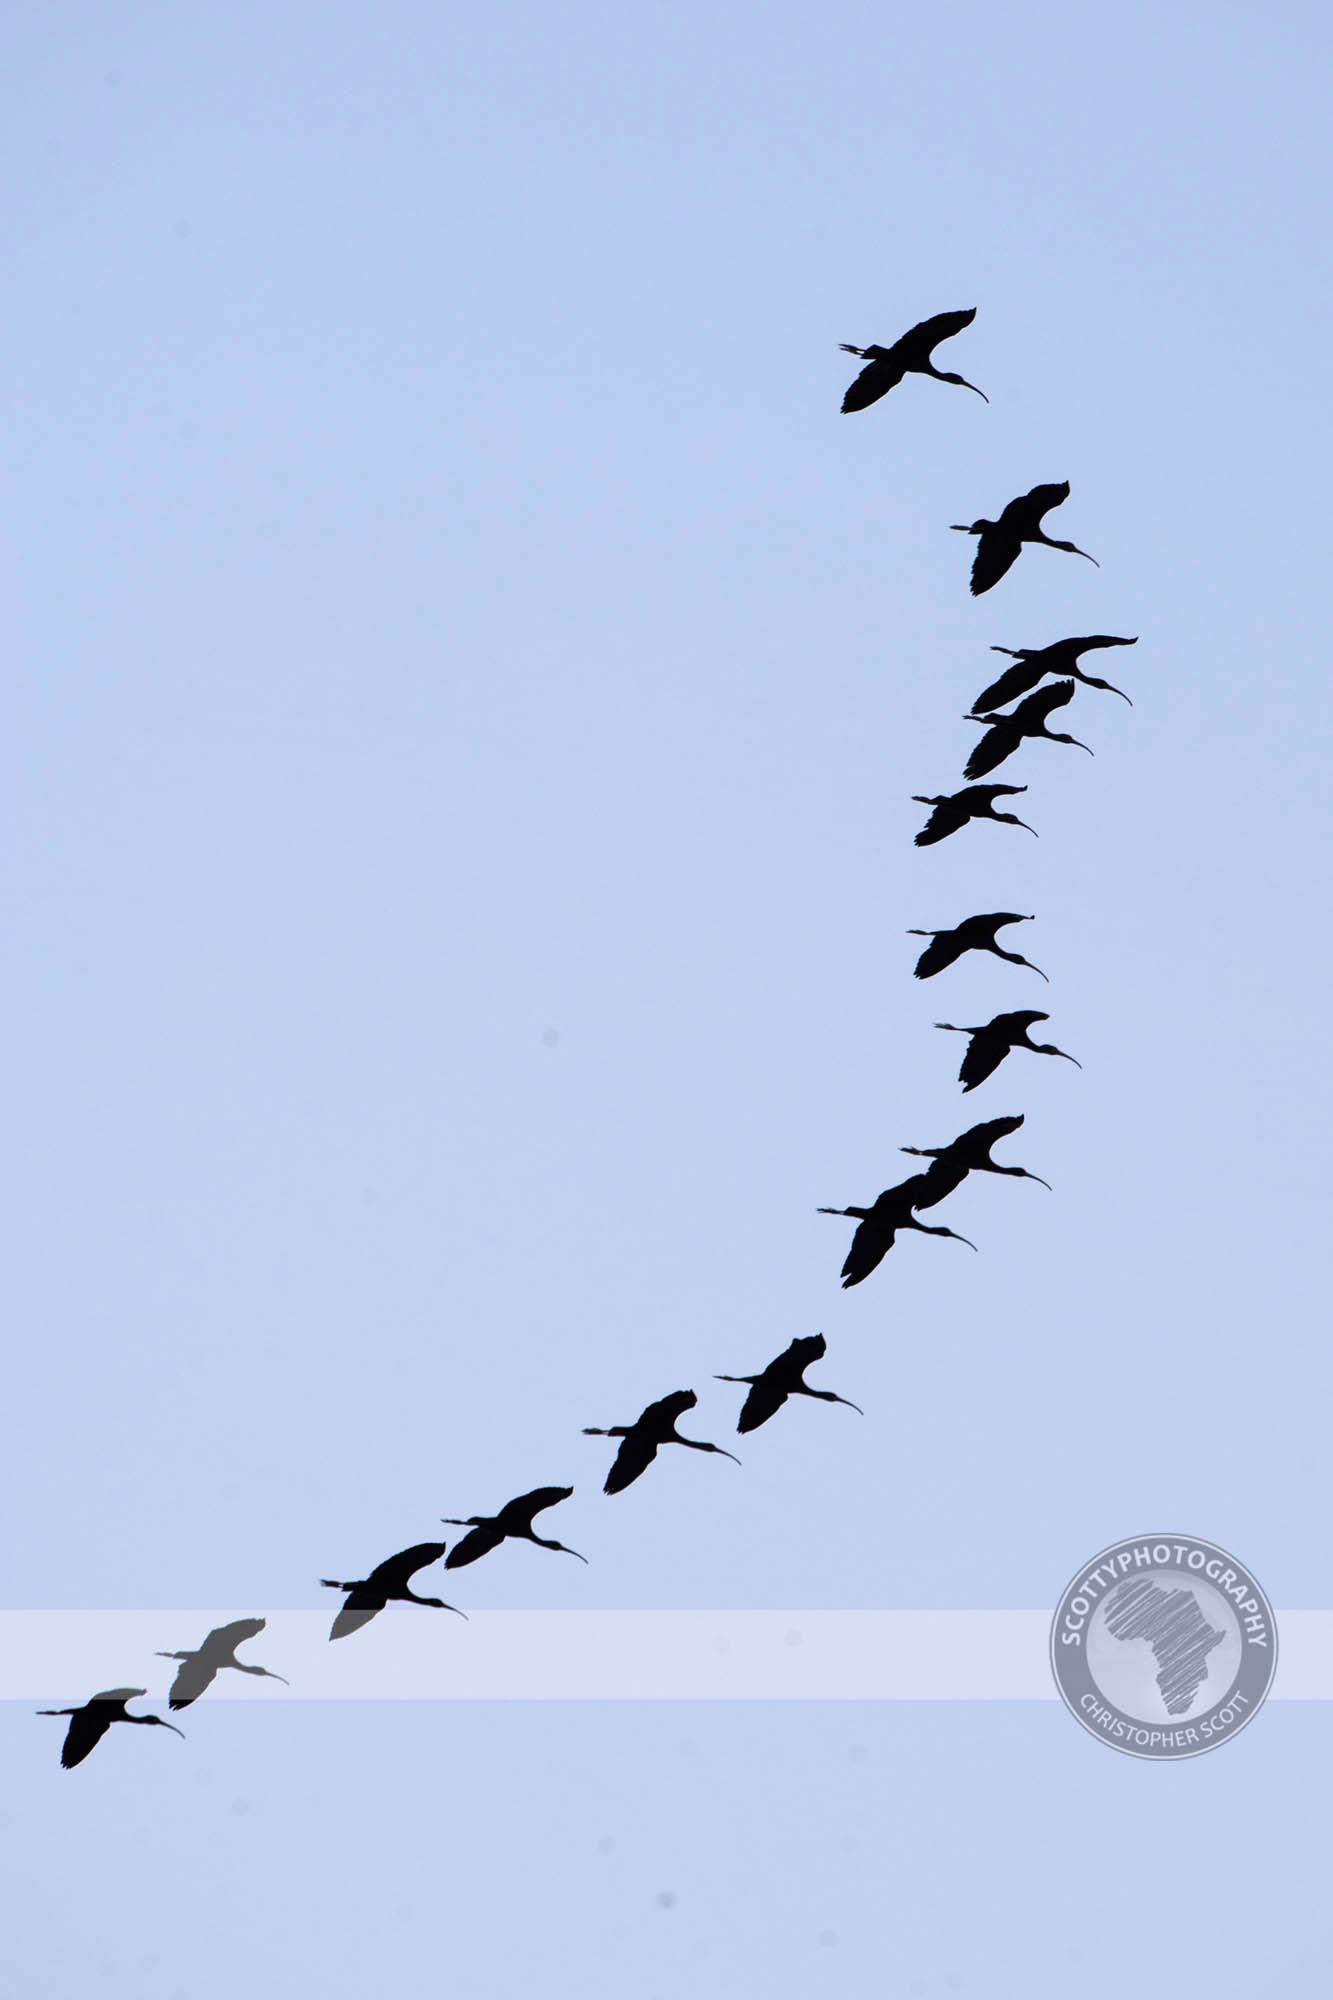 Ibis, Glossy-40.jpg